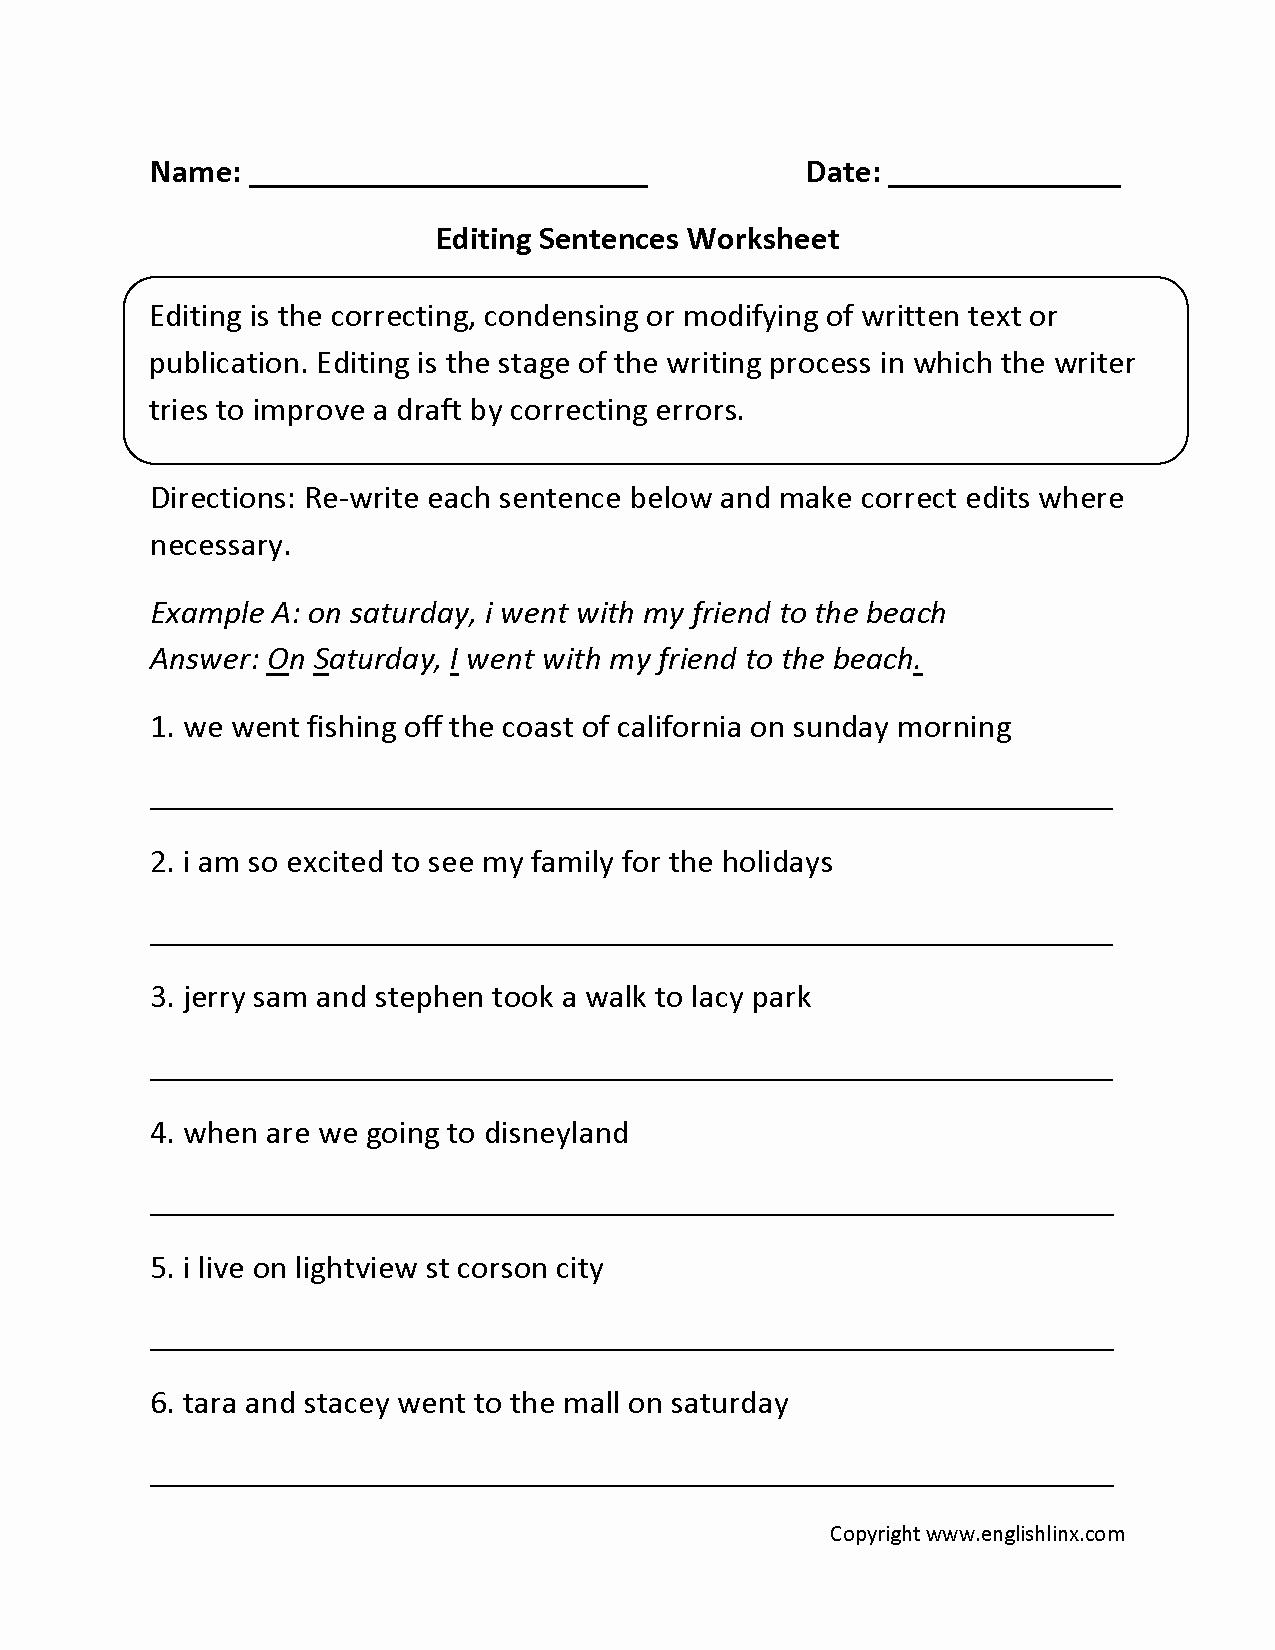 Proofreading Worksheets 3rd Grade Beautiful Sentence Editing 3rd Grade Daily Paragraph Editing 3rd